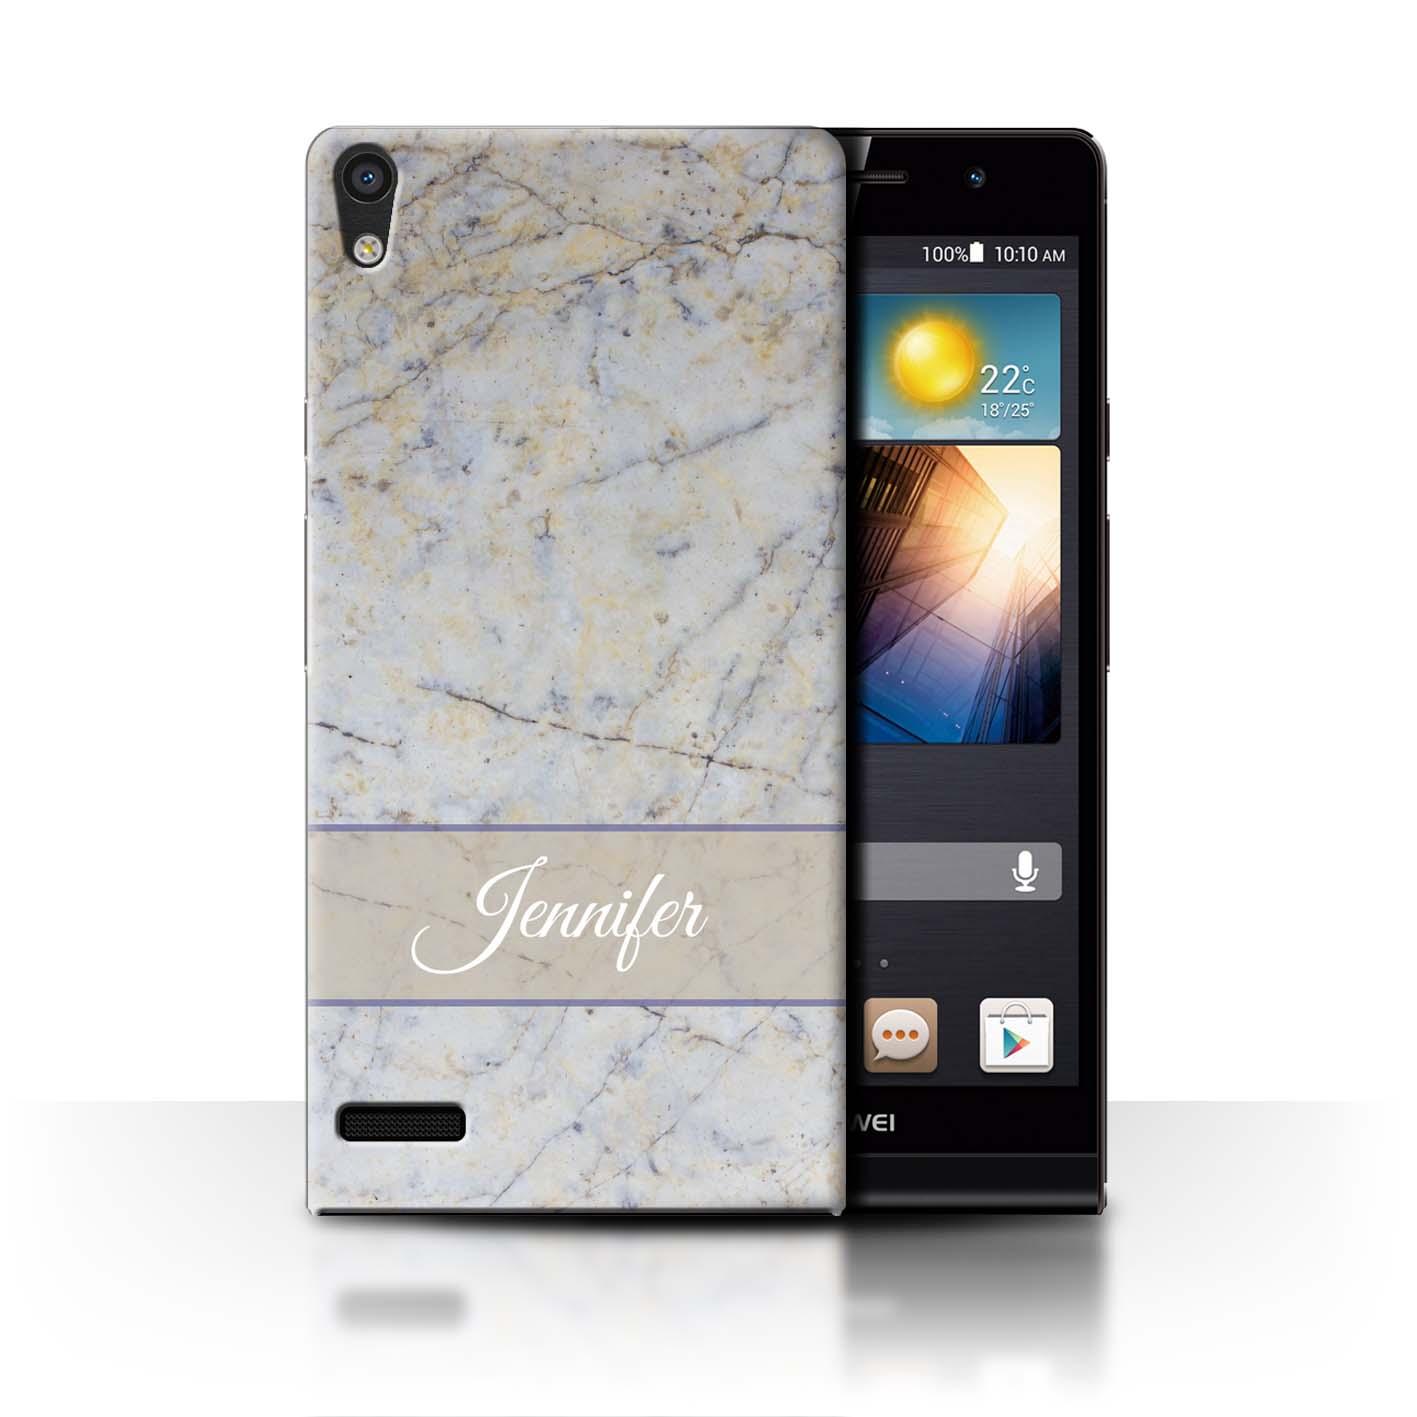 Personalizado-Marmol-Funda-Para-Telefono-funda-Para-Huawei-P-Smartphone-Inicial